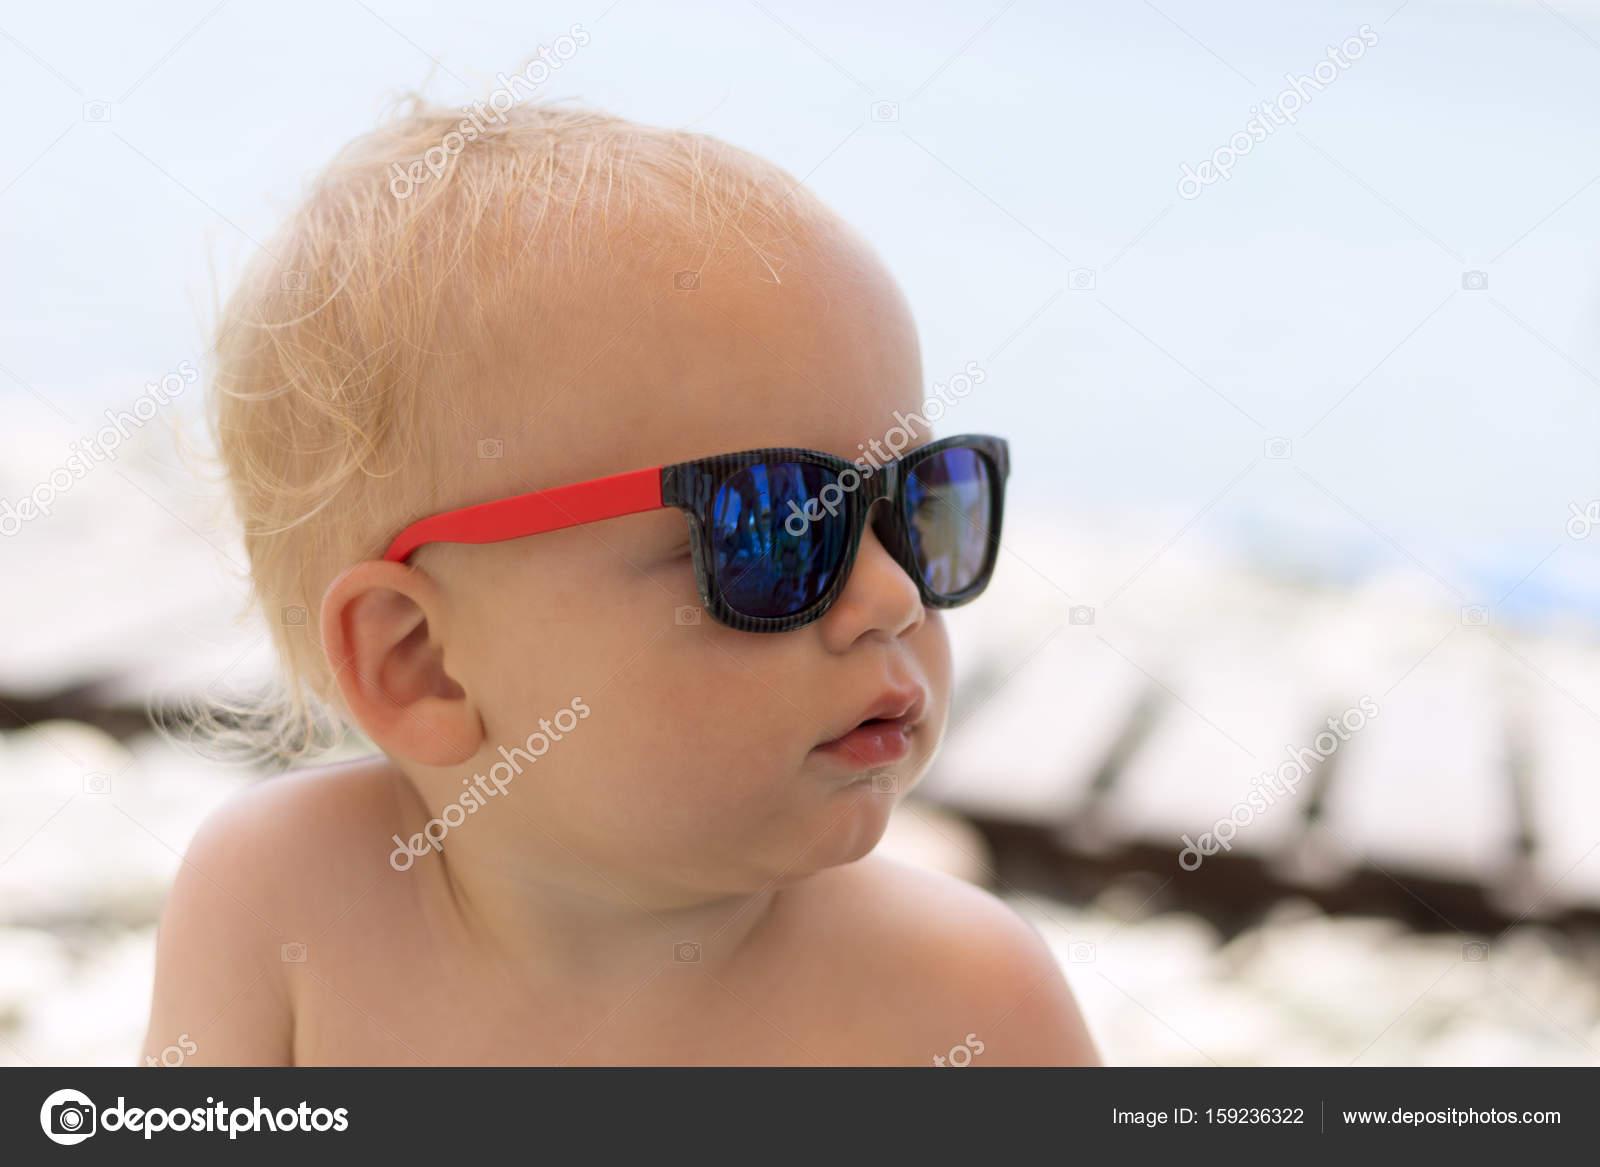 84d4a3fd0a Σοβαρή χαριτωμένο μικρό παιδί σε γυαλιά ηλίου στην παραλία — Εικόνα από ...